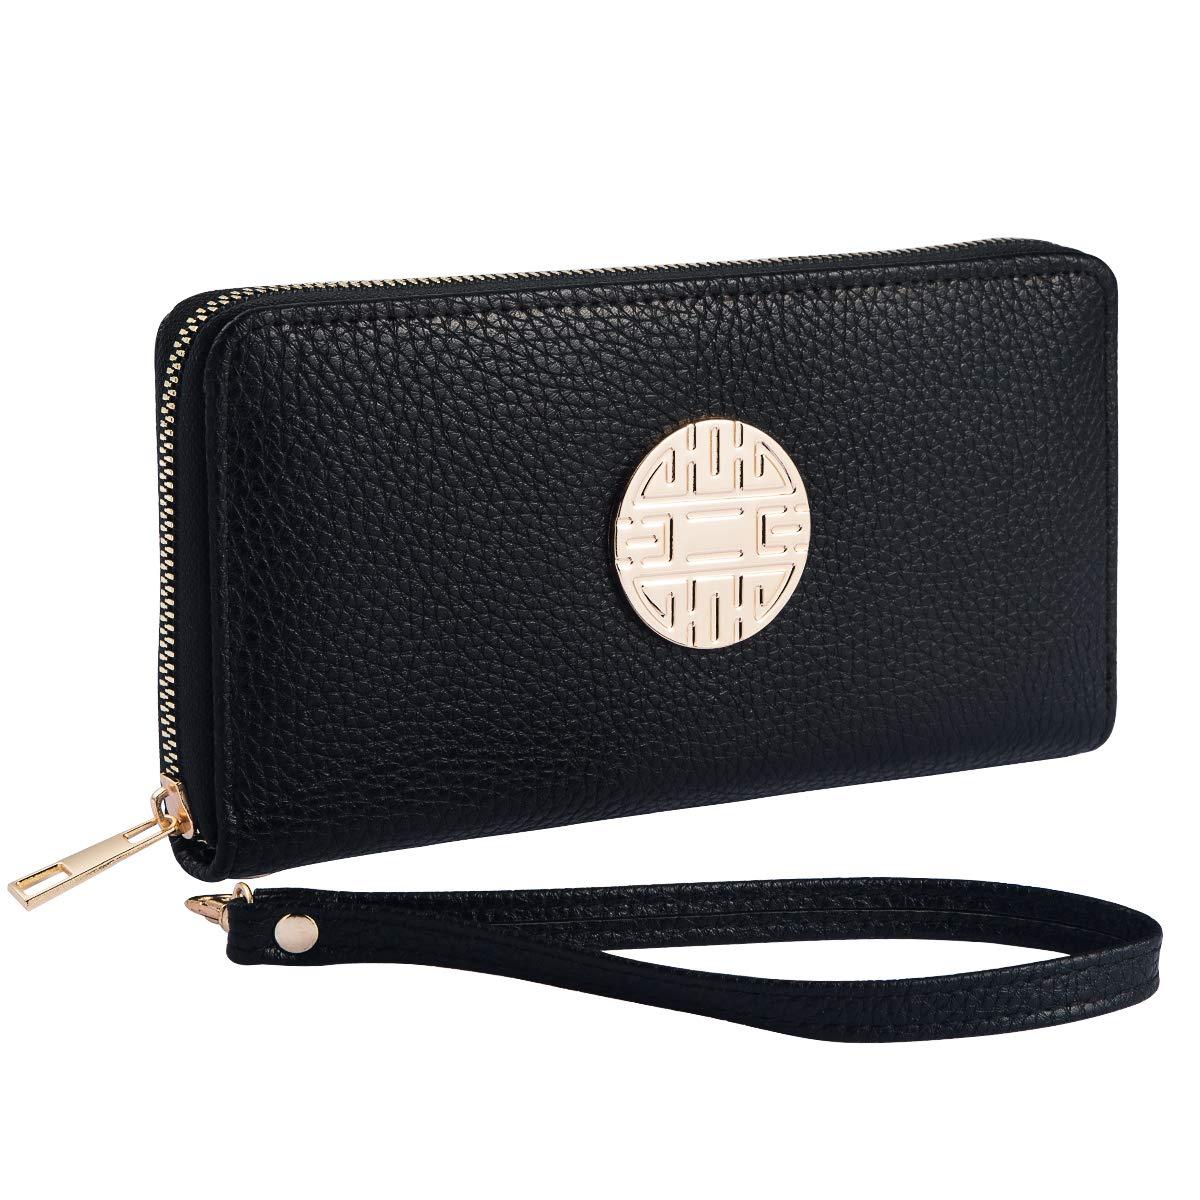 Heaye Emblem Wristlet Wallet for Women with Wrist Strap Zip Around